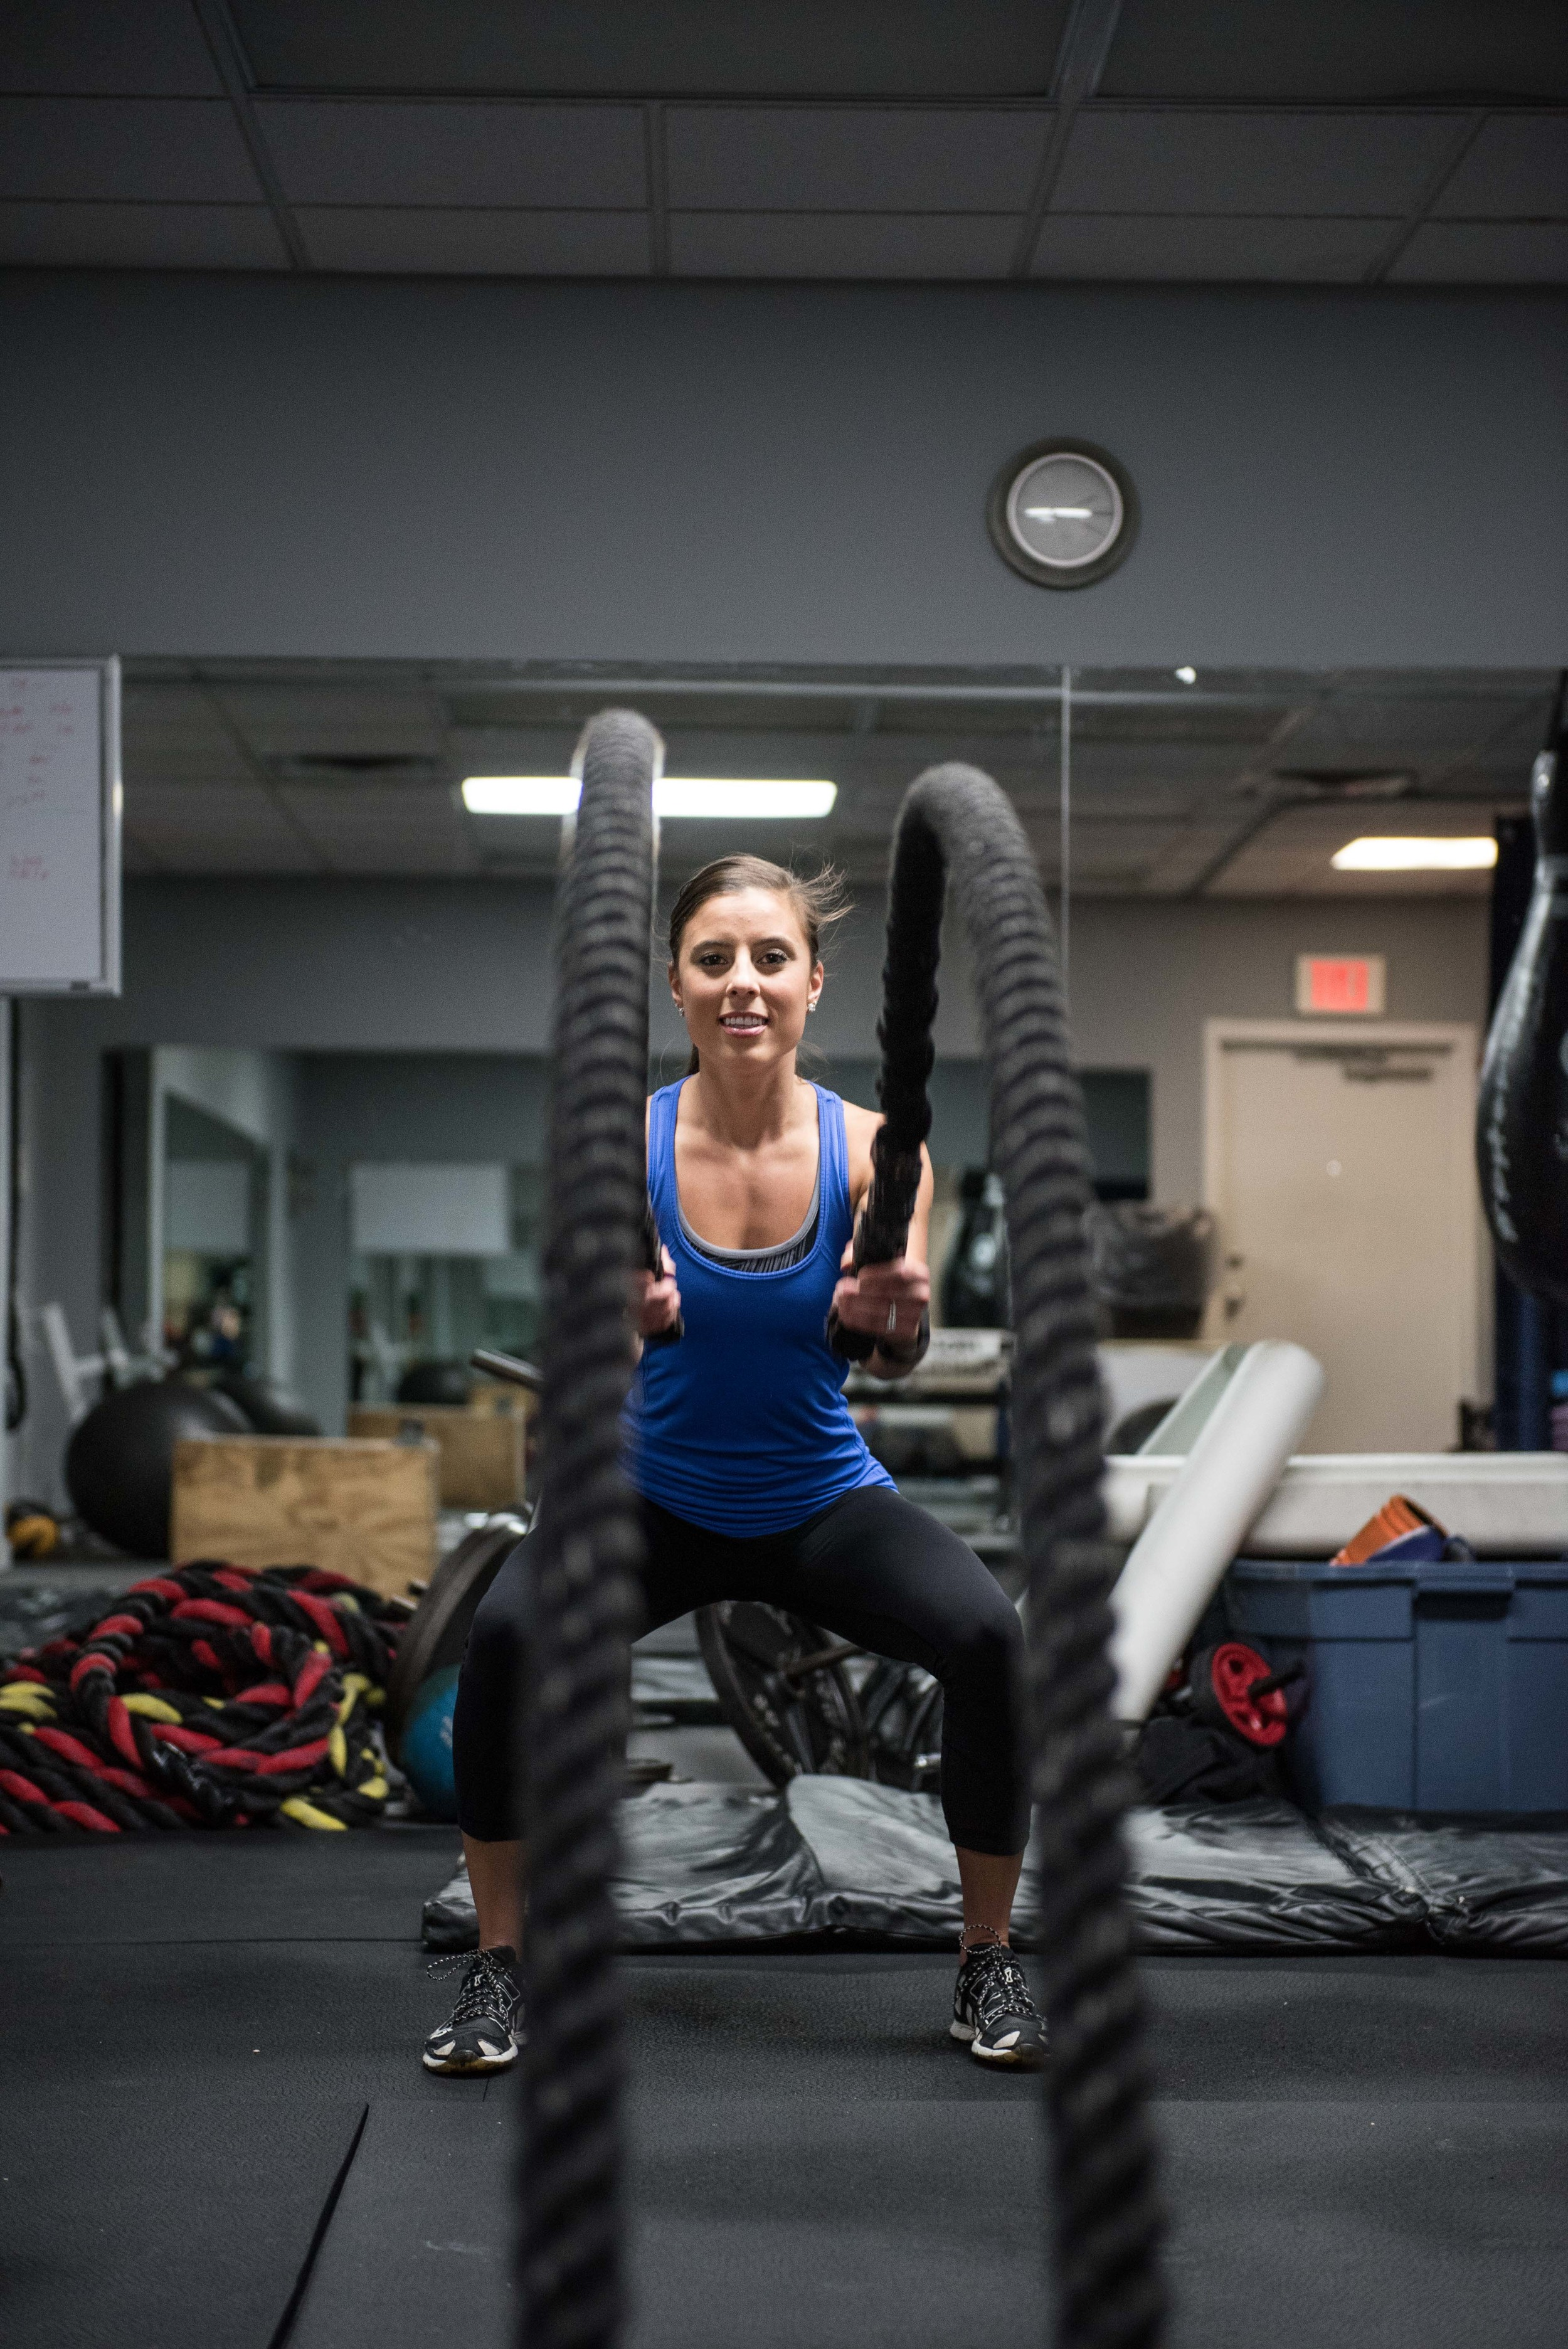 Rope Smasher Workout